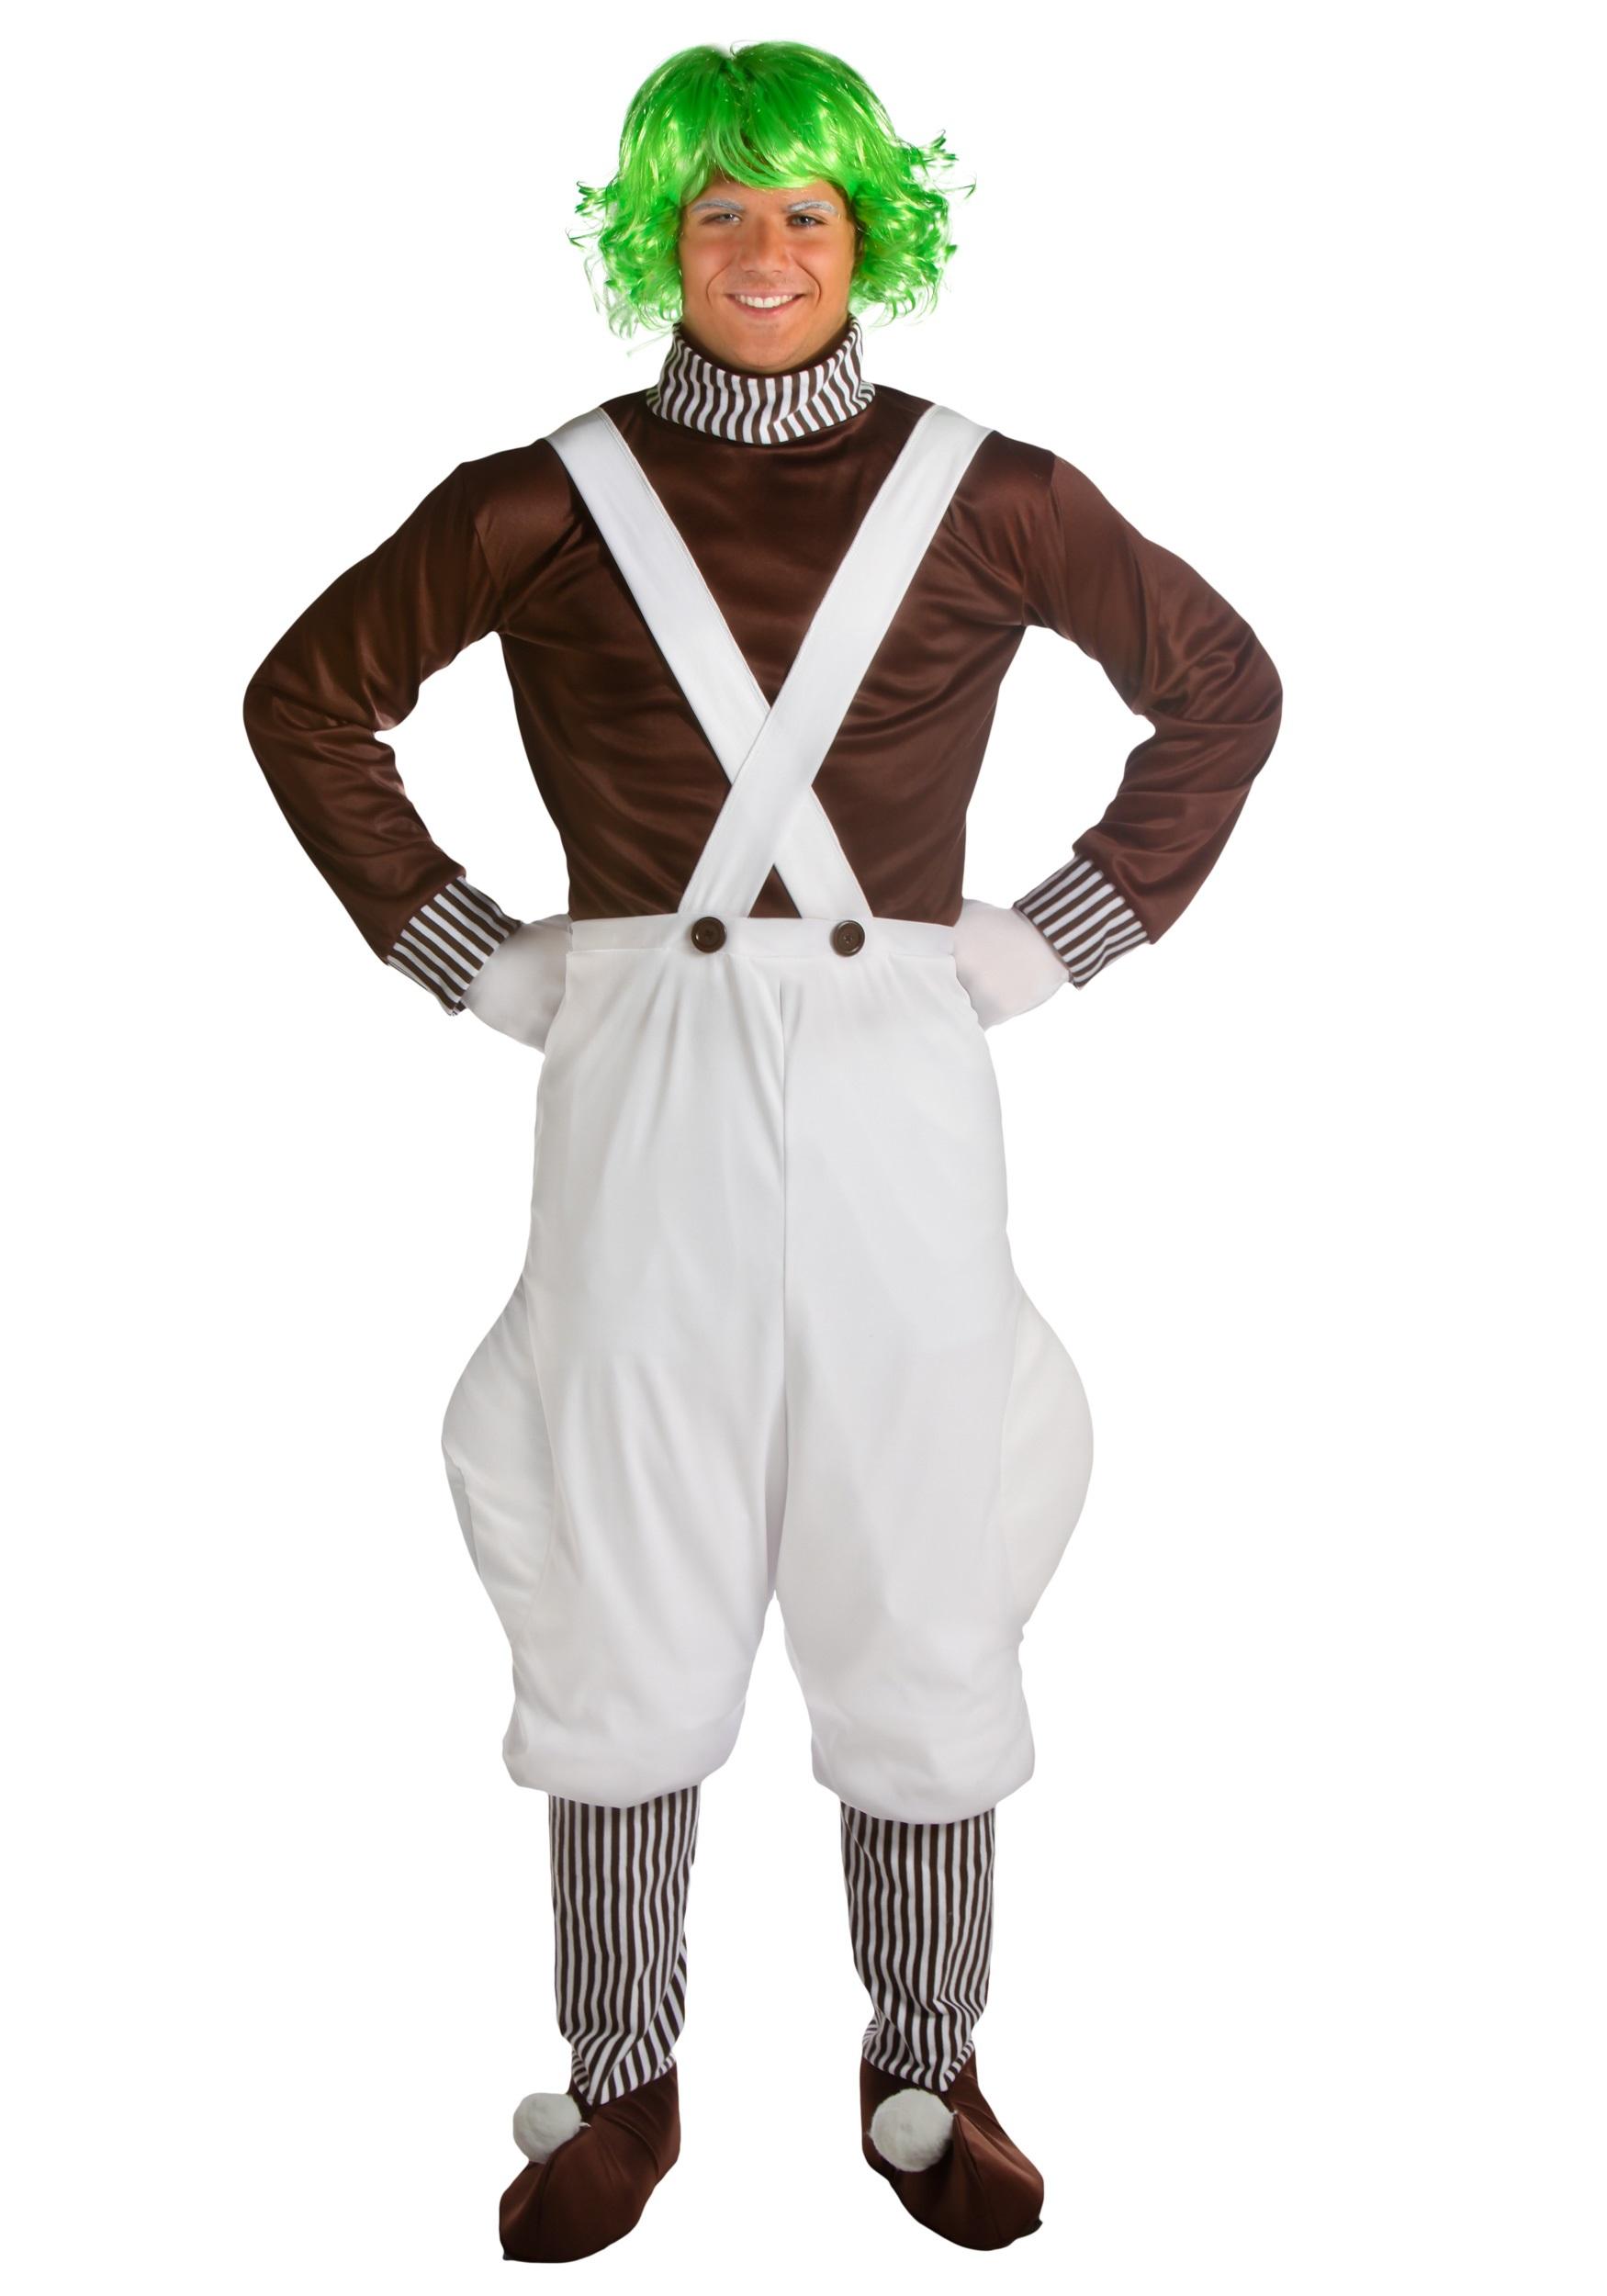 Oompa Loompa Plus Size Costume for Men